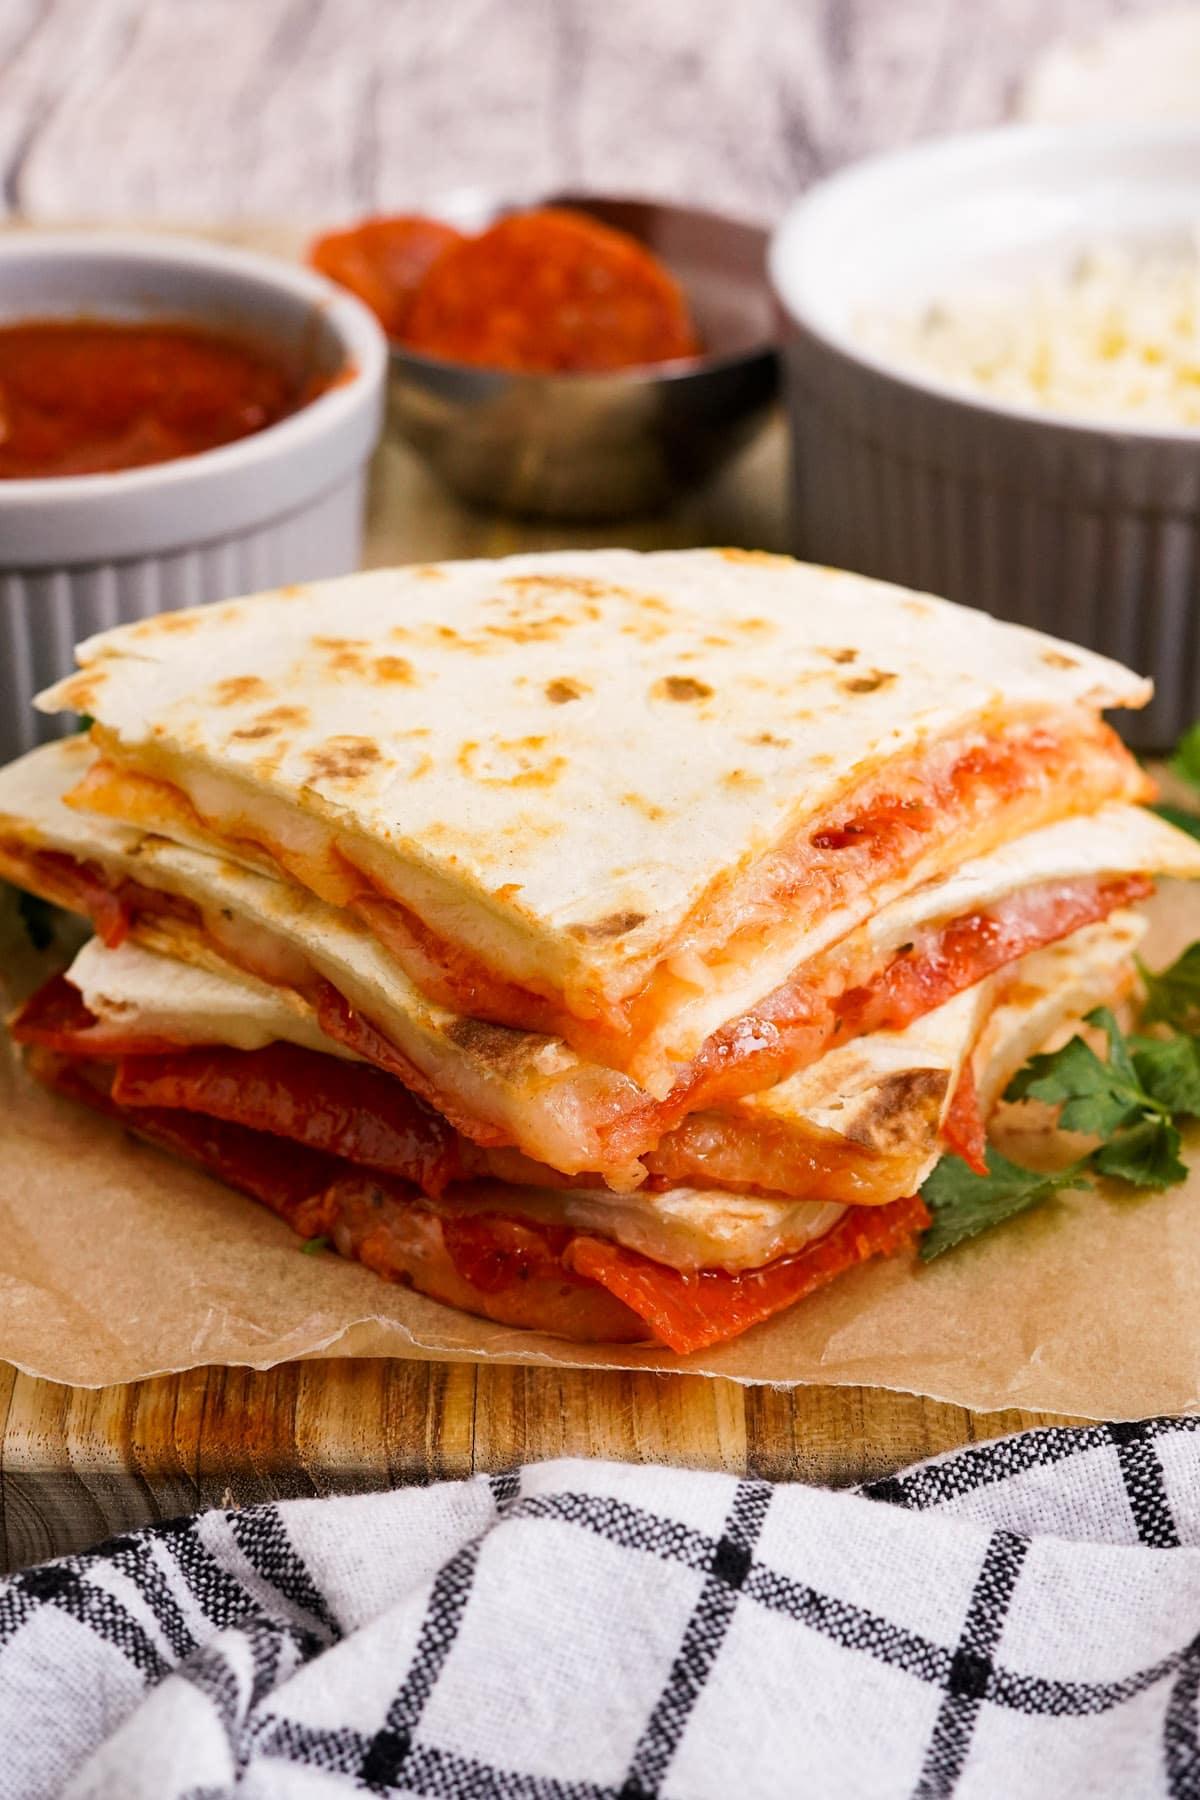 Pizza Quesadillas hero image